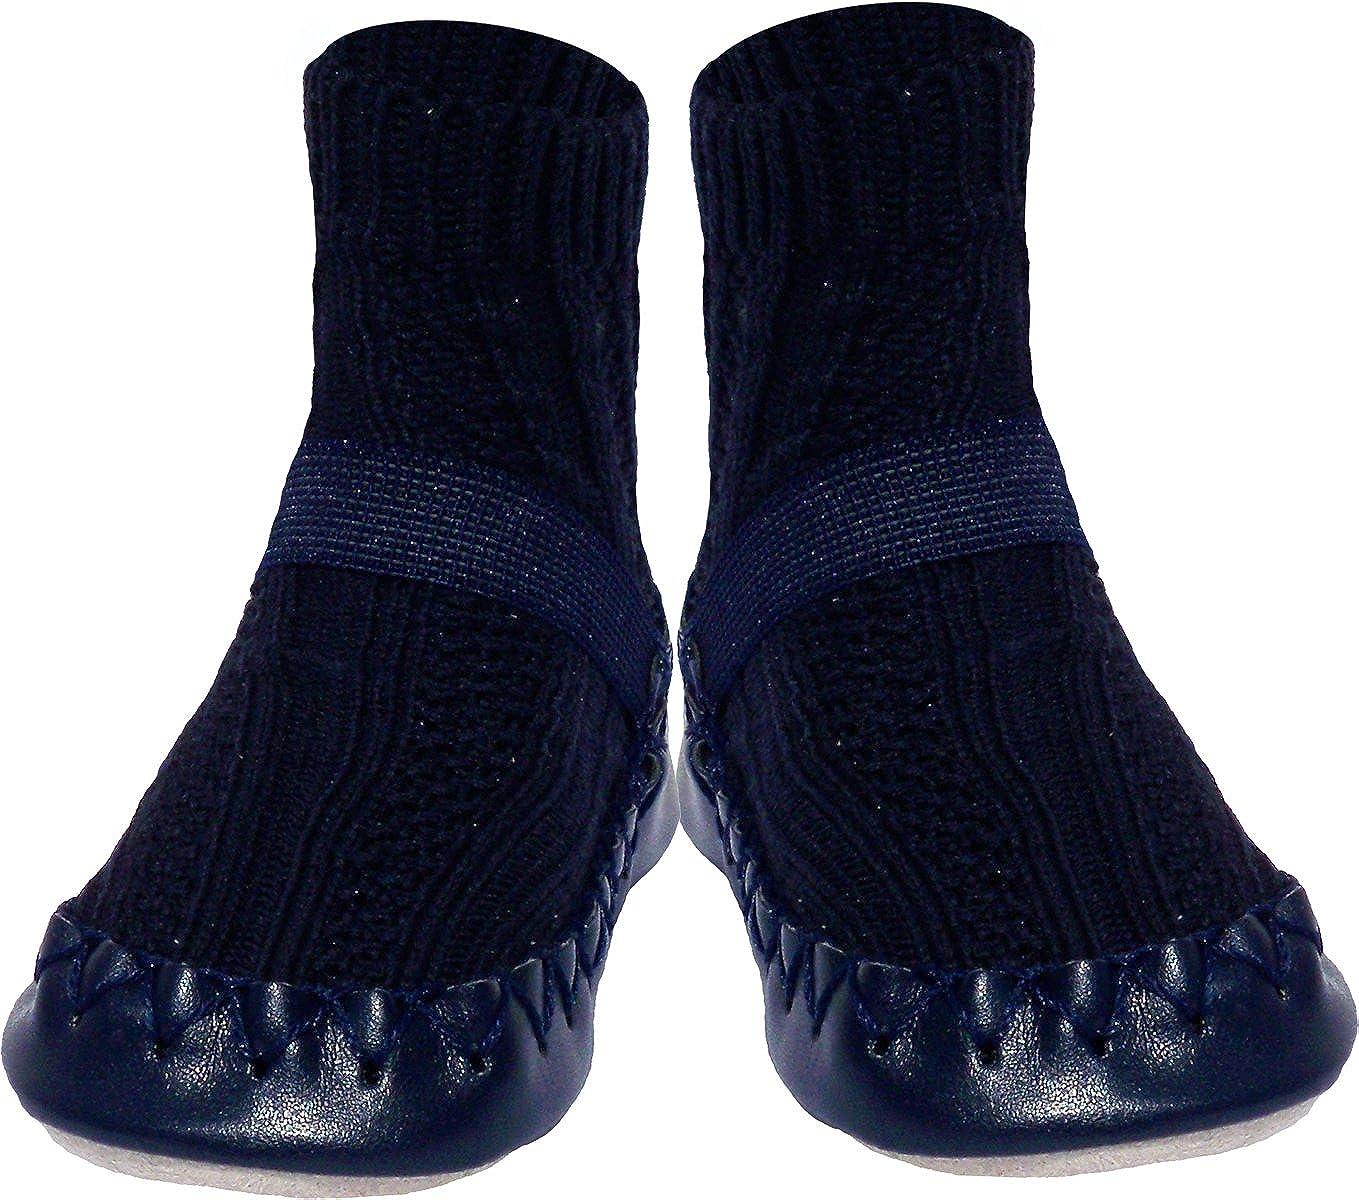 Konfetti Cable Knit Swedish Socks Slipper 2021 model Omaha Mall Moccasin